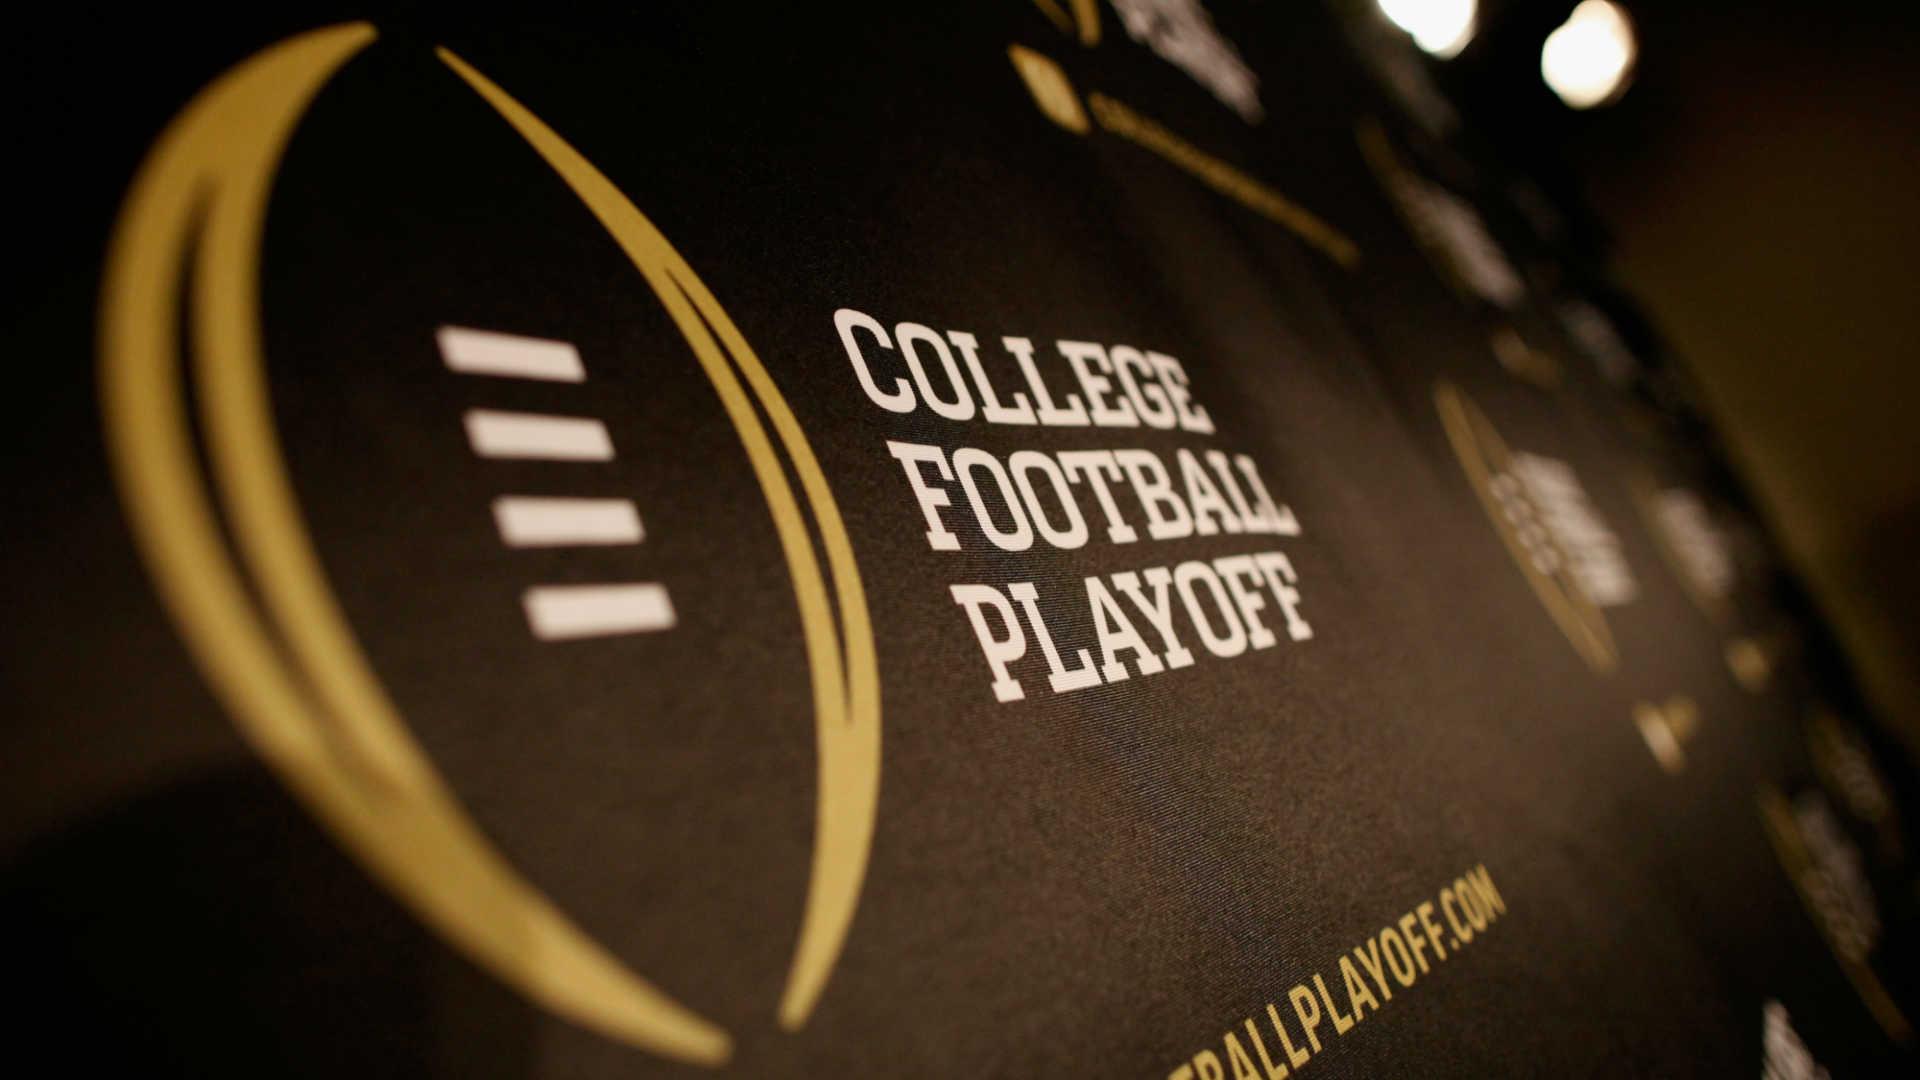 collegefootballplayoff ncaa standings football